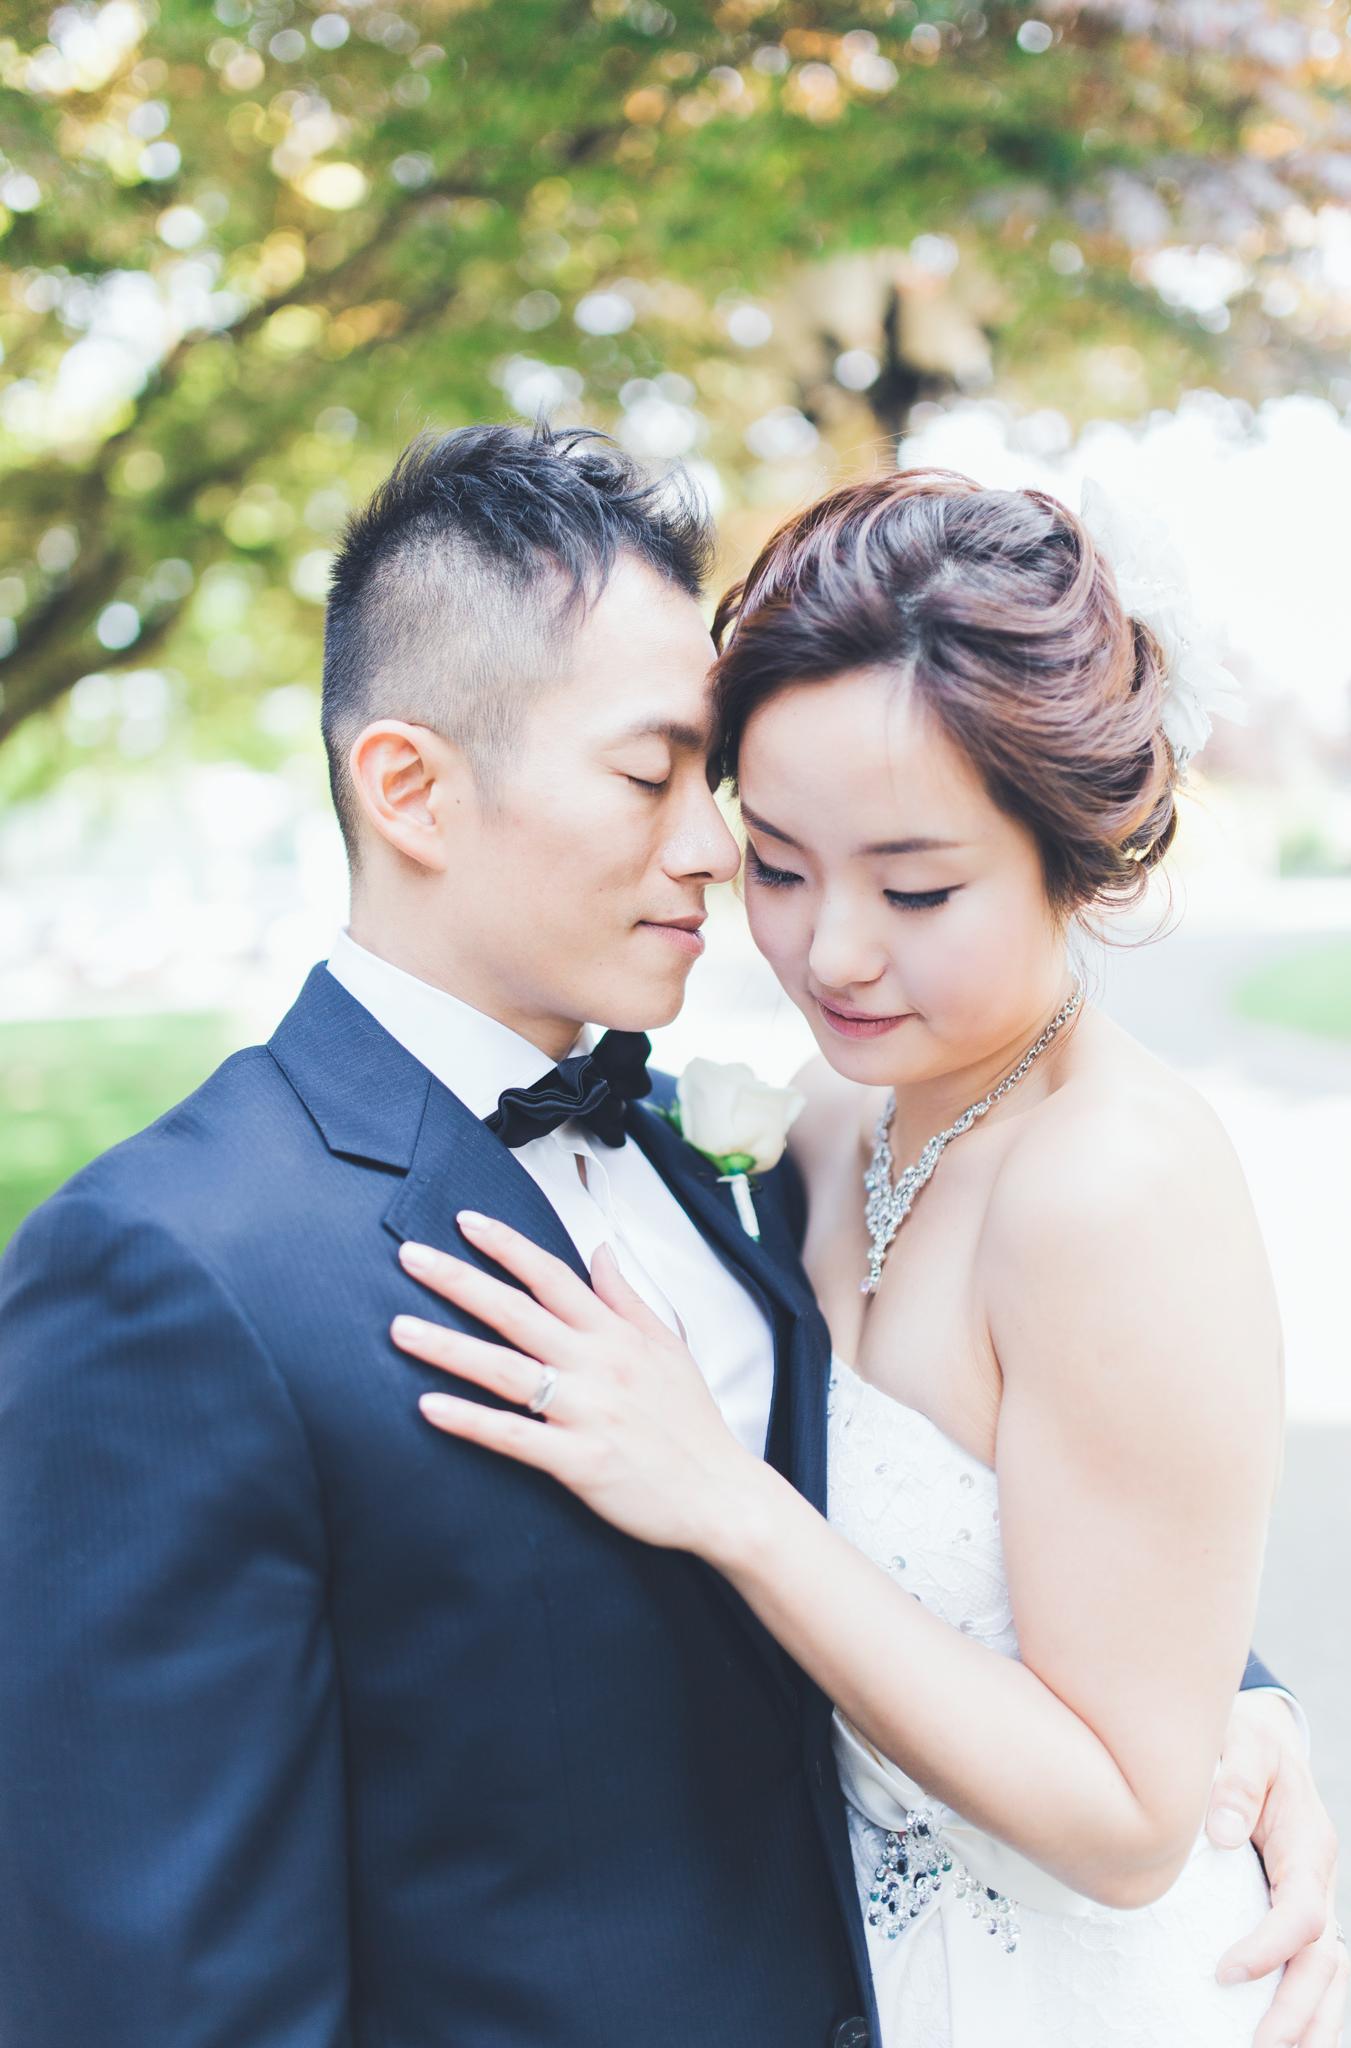 IMG_2764-VANCOUVER-WEDDING-PHOTOGRAPHER-JENNIFER-PICARD-PHOTOGRAPHY-FINE-ART-WEDDINGS.jpg